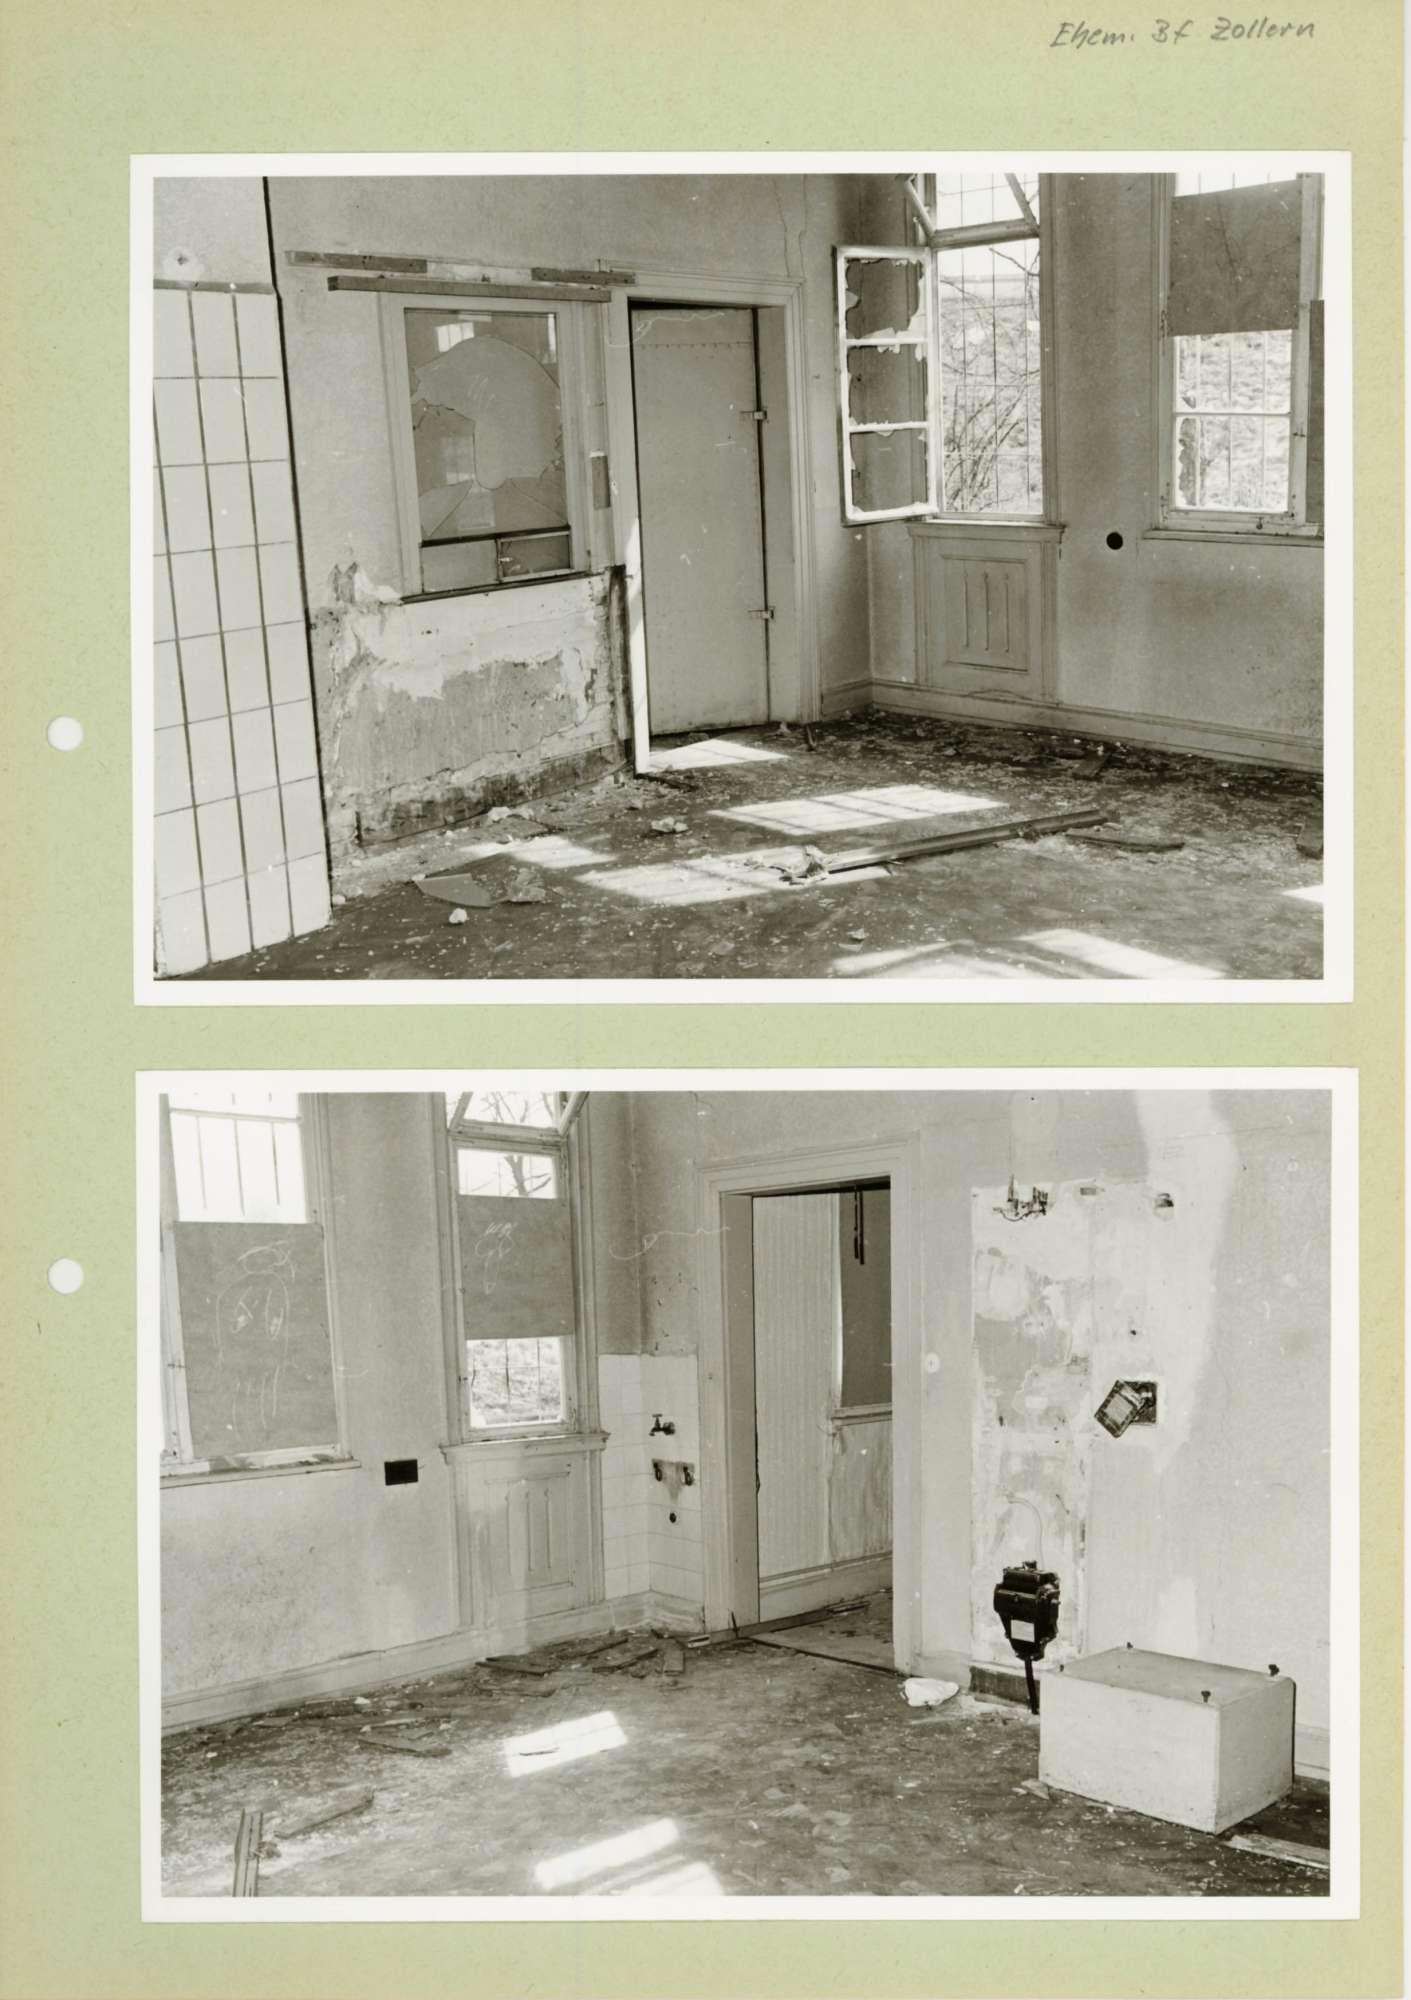 Zollern (ehemaliger Bf): 12 Fotos, Bild 2